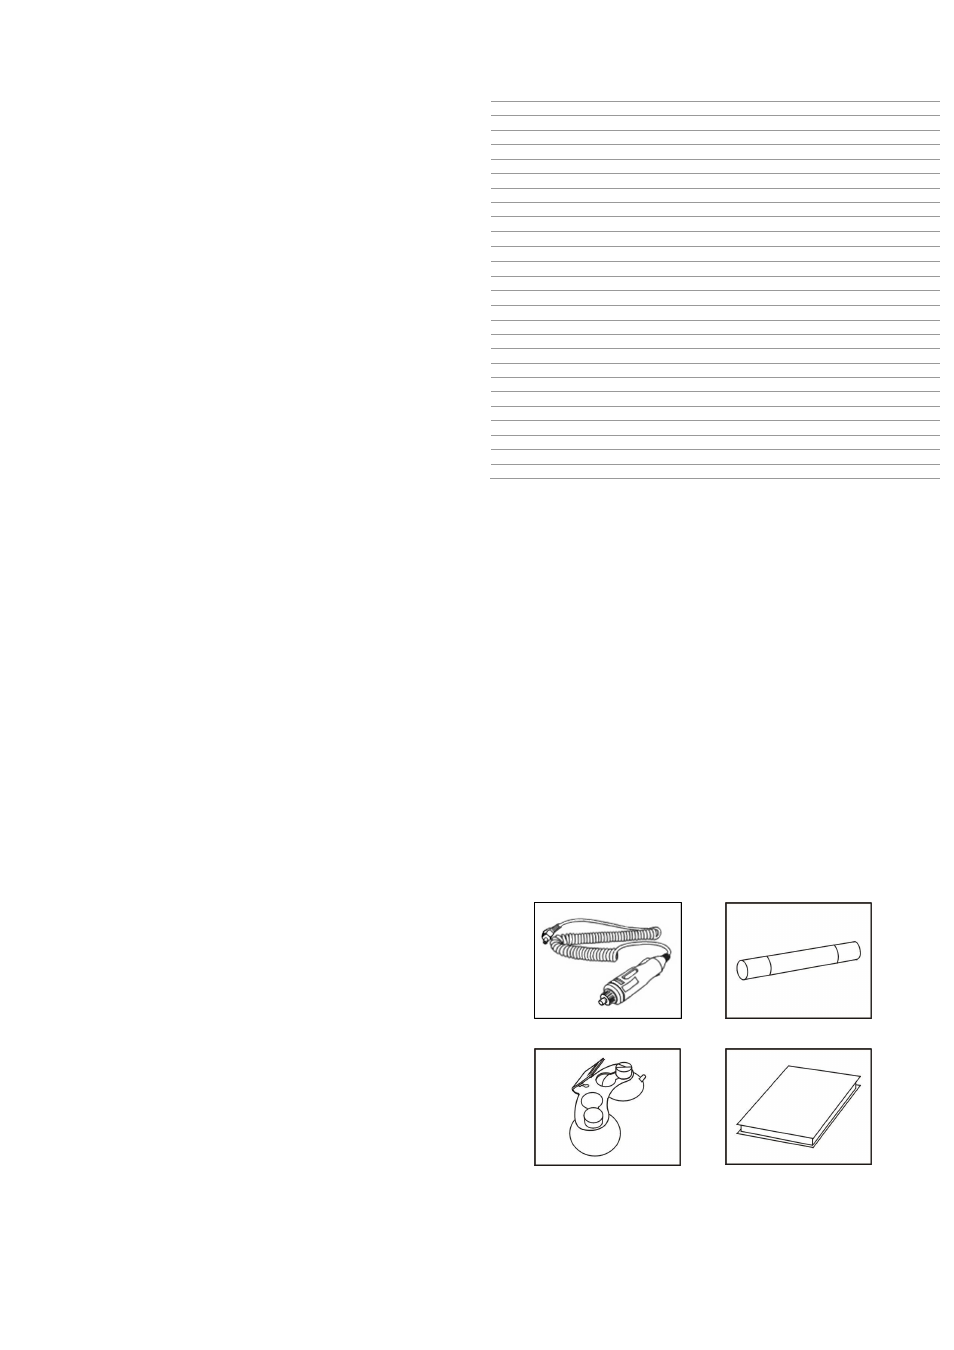 Антирадар Crunch 223b инструкция по применению - картинка 2